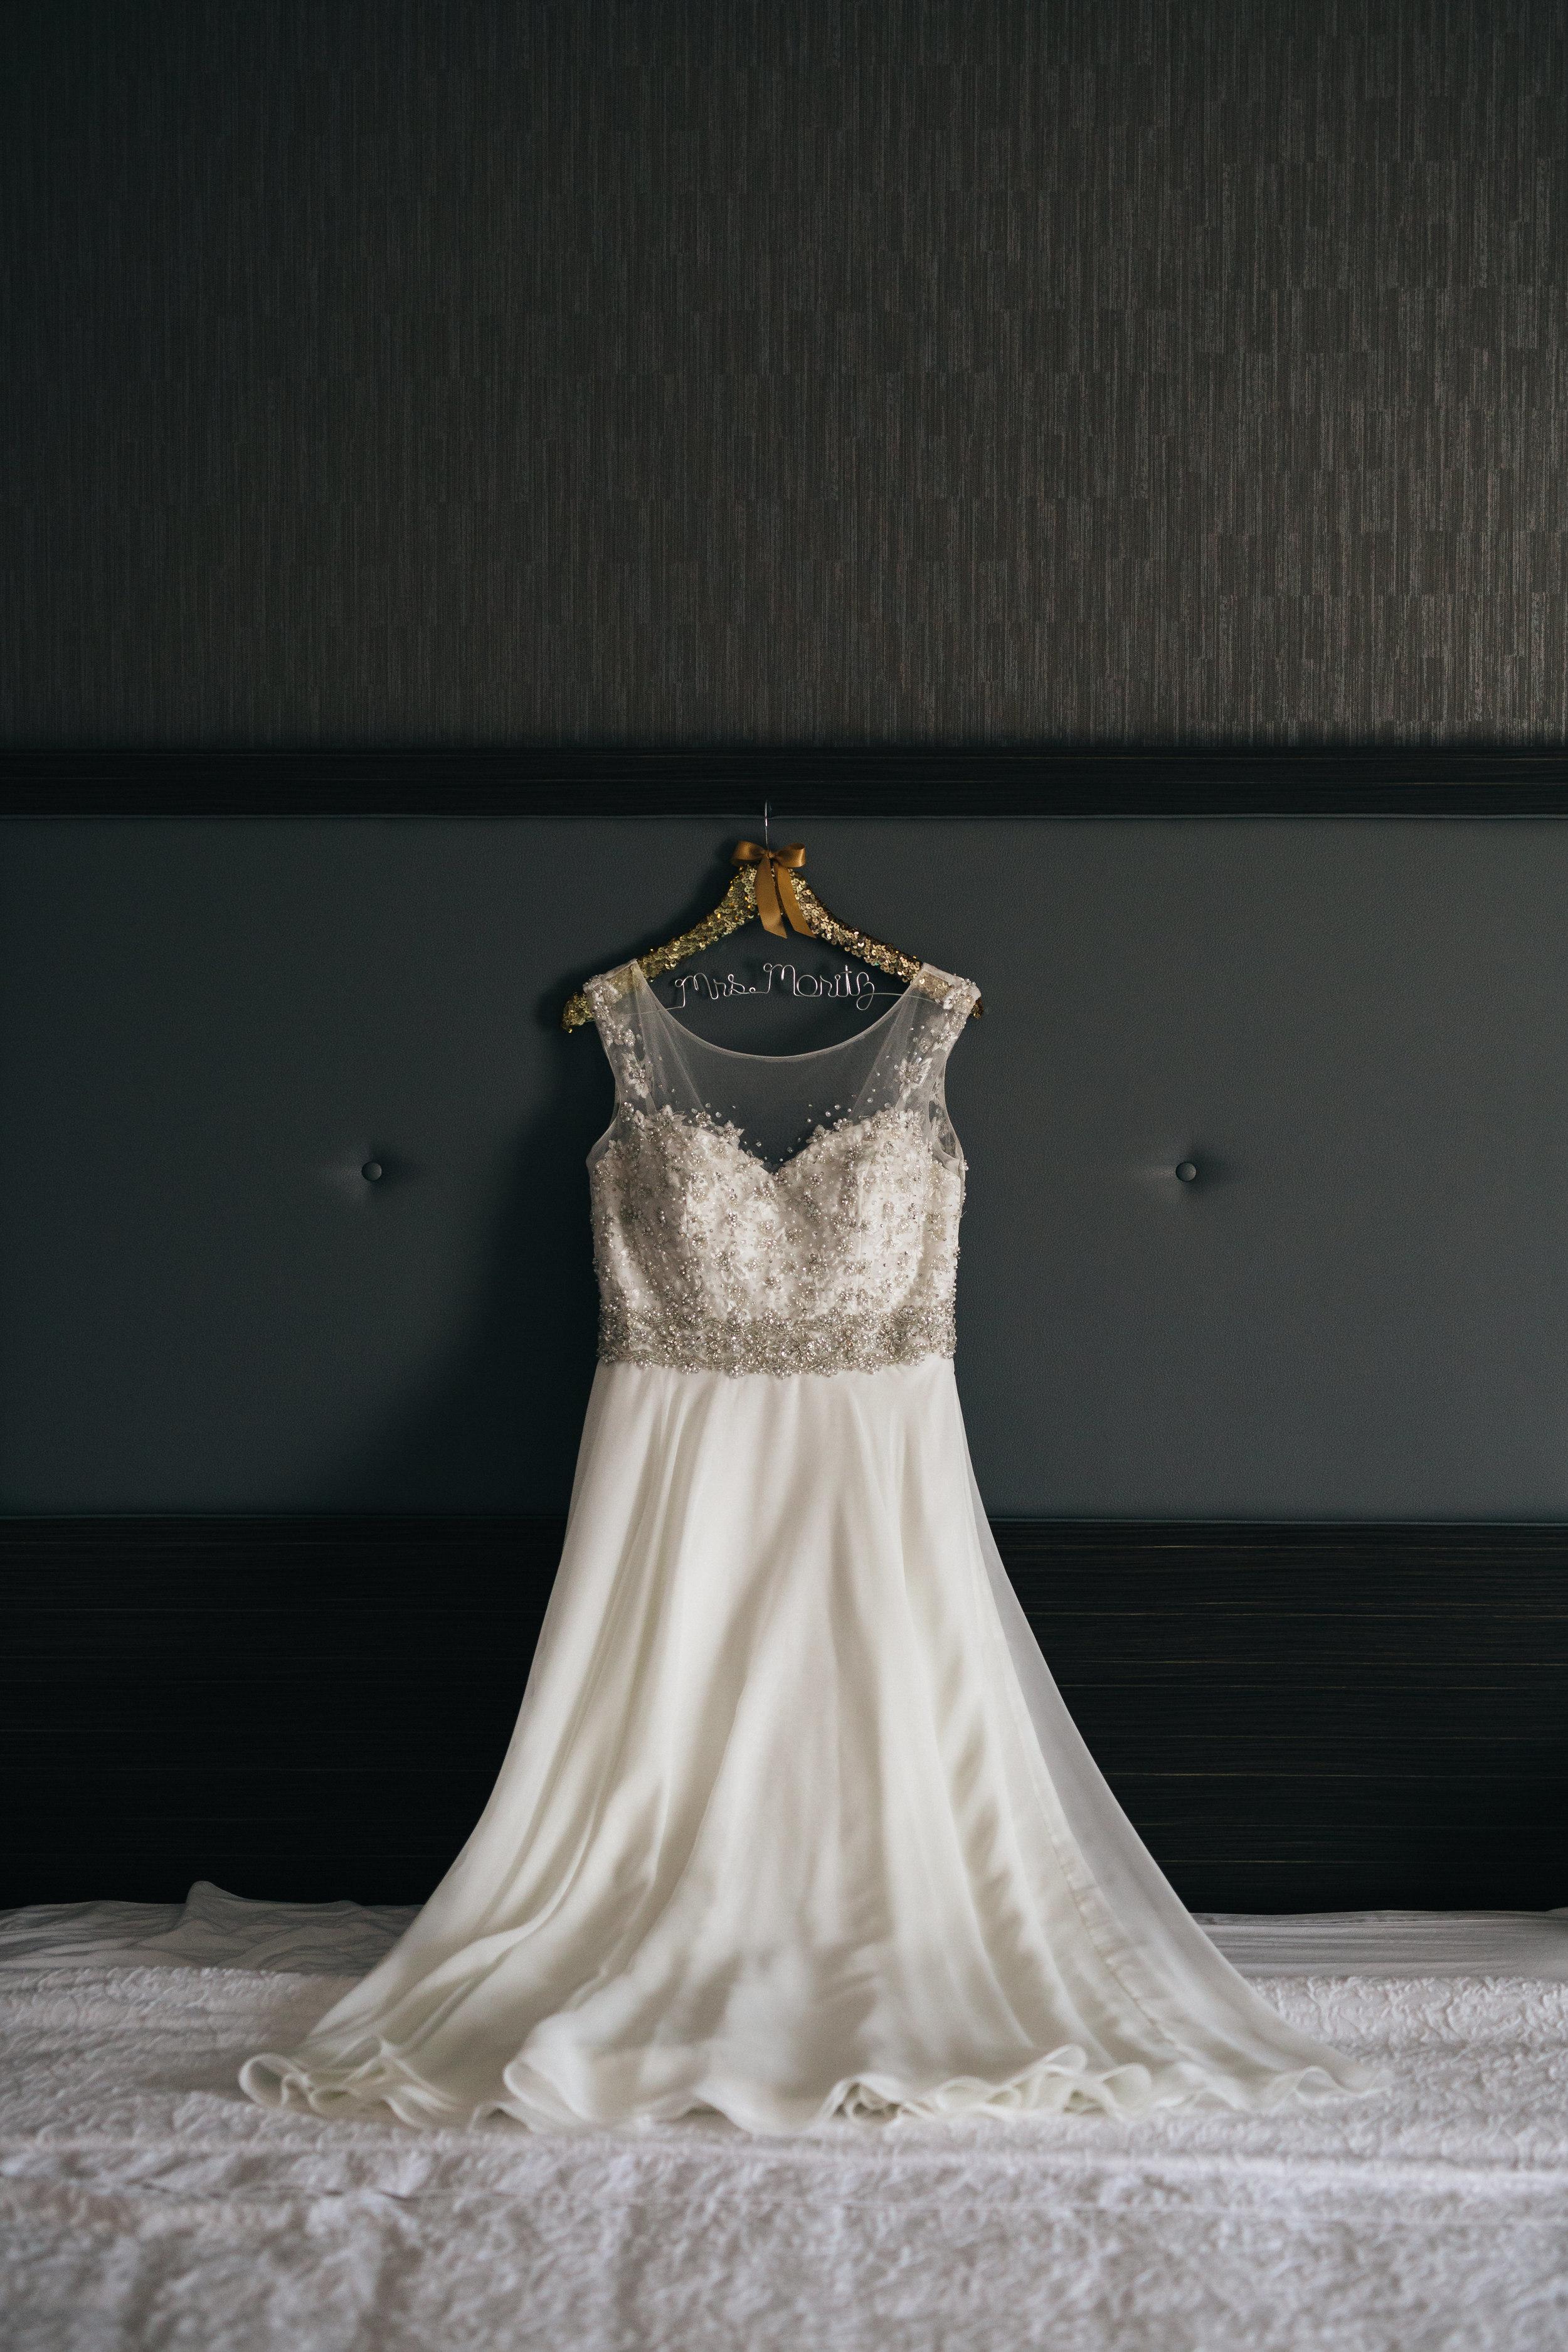 Elegant wedding dress with lace details for summer wedding in Oregon, Ohio.